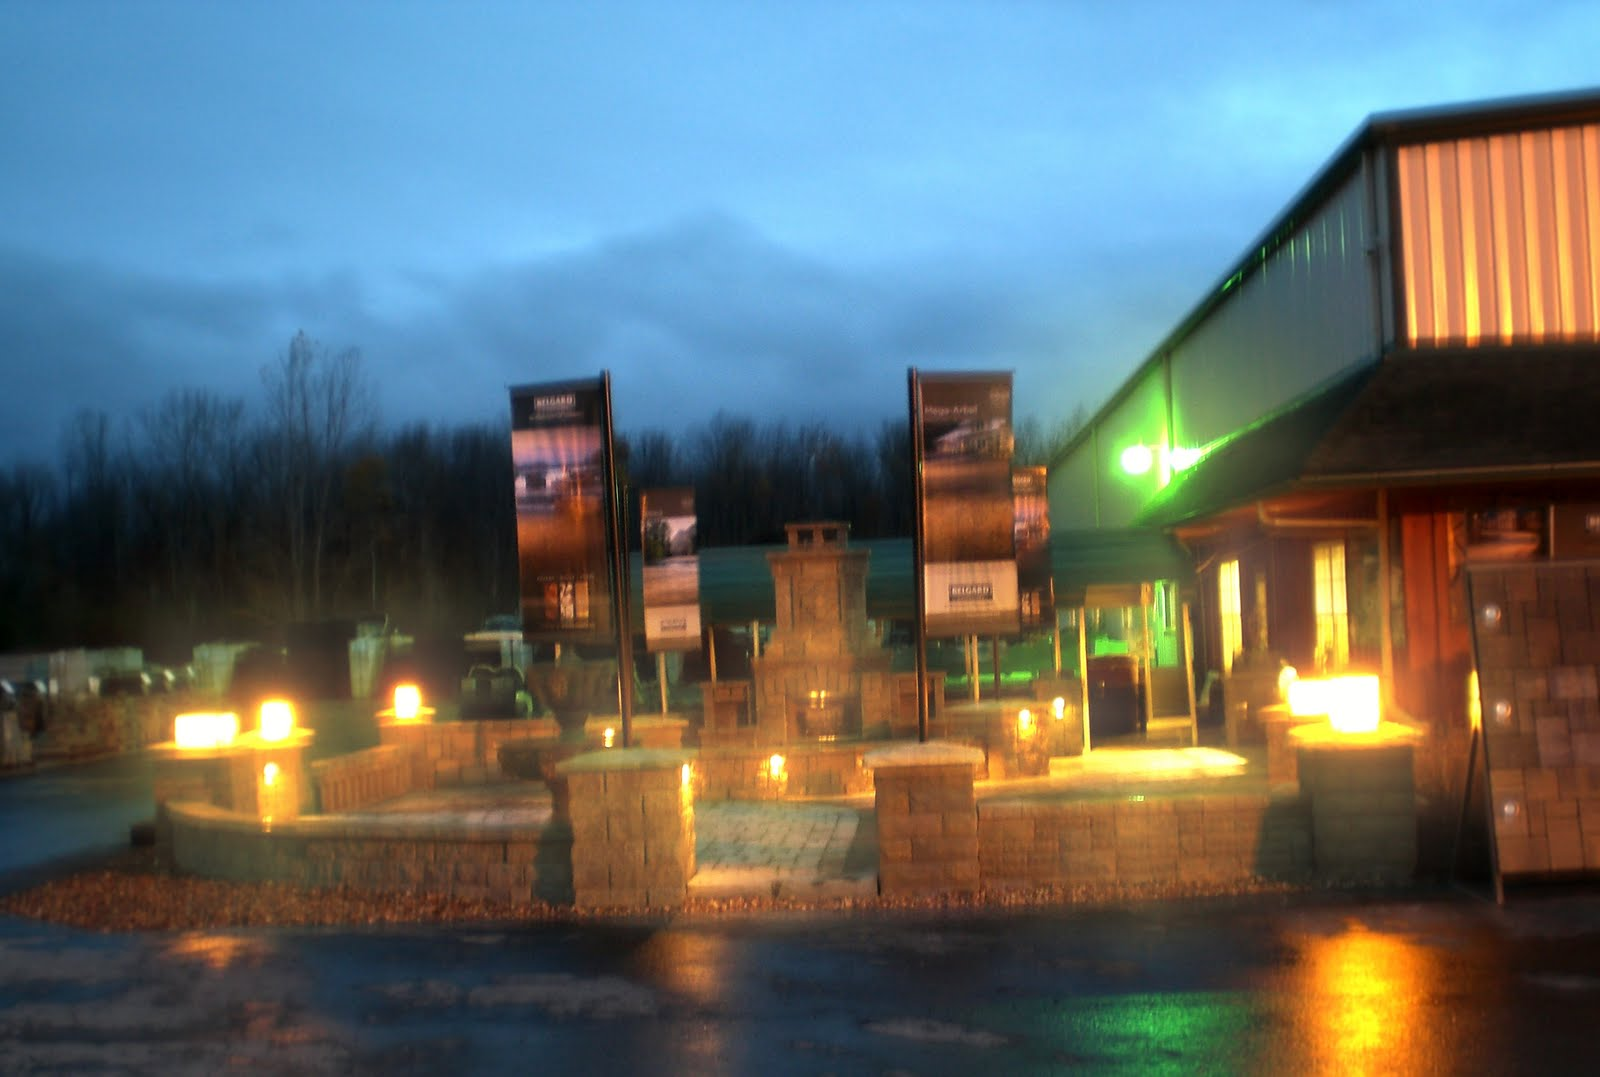 Sensenigs landscape supply our new belard troy lighting for Landscape lighting supply